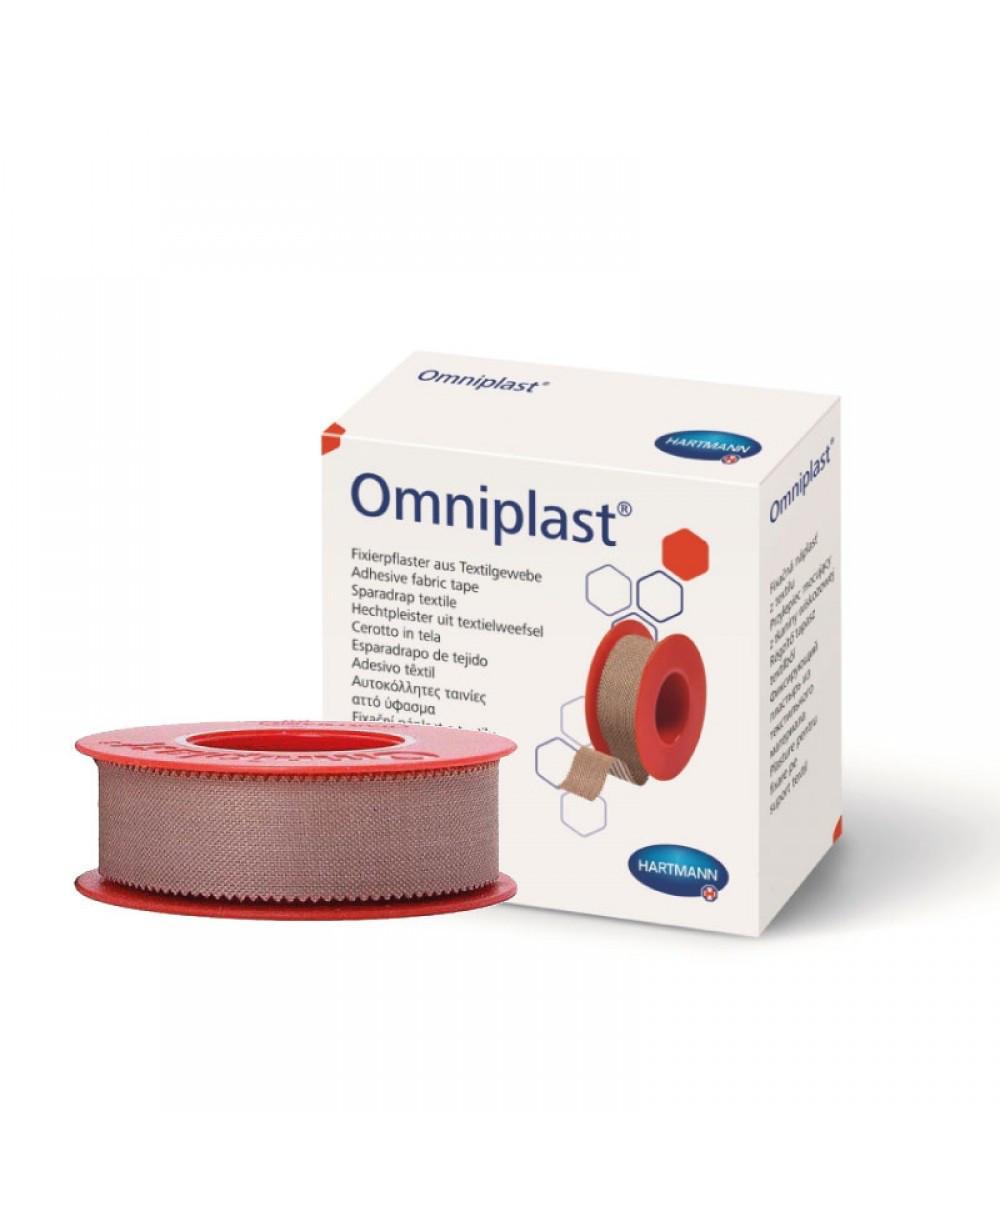 Omniplast / Омнипласт - фиксирующий пластырь из текстильной ткани 5 см х 5 м